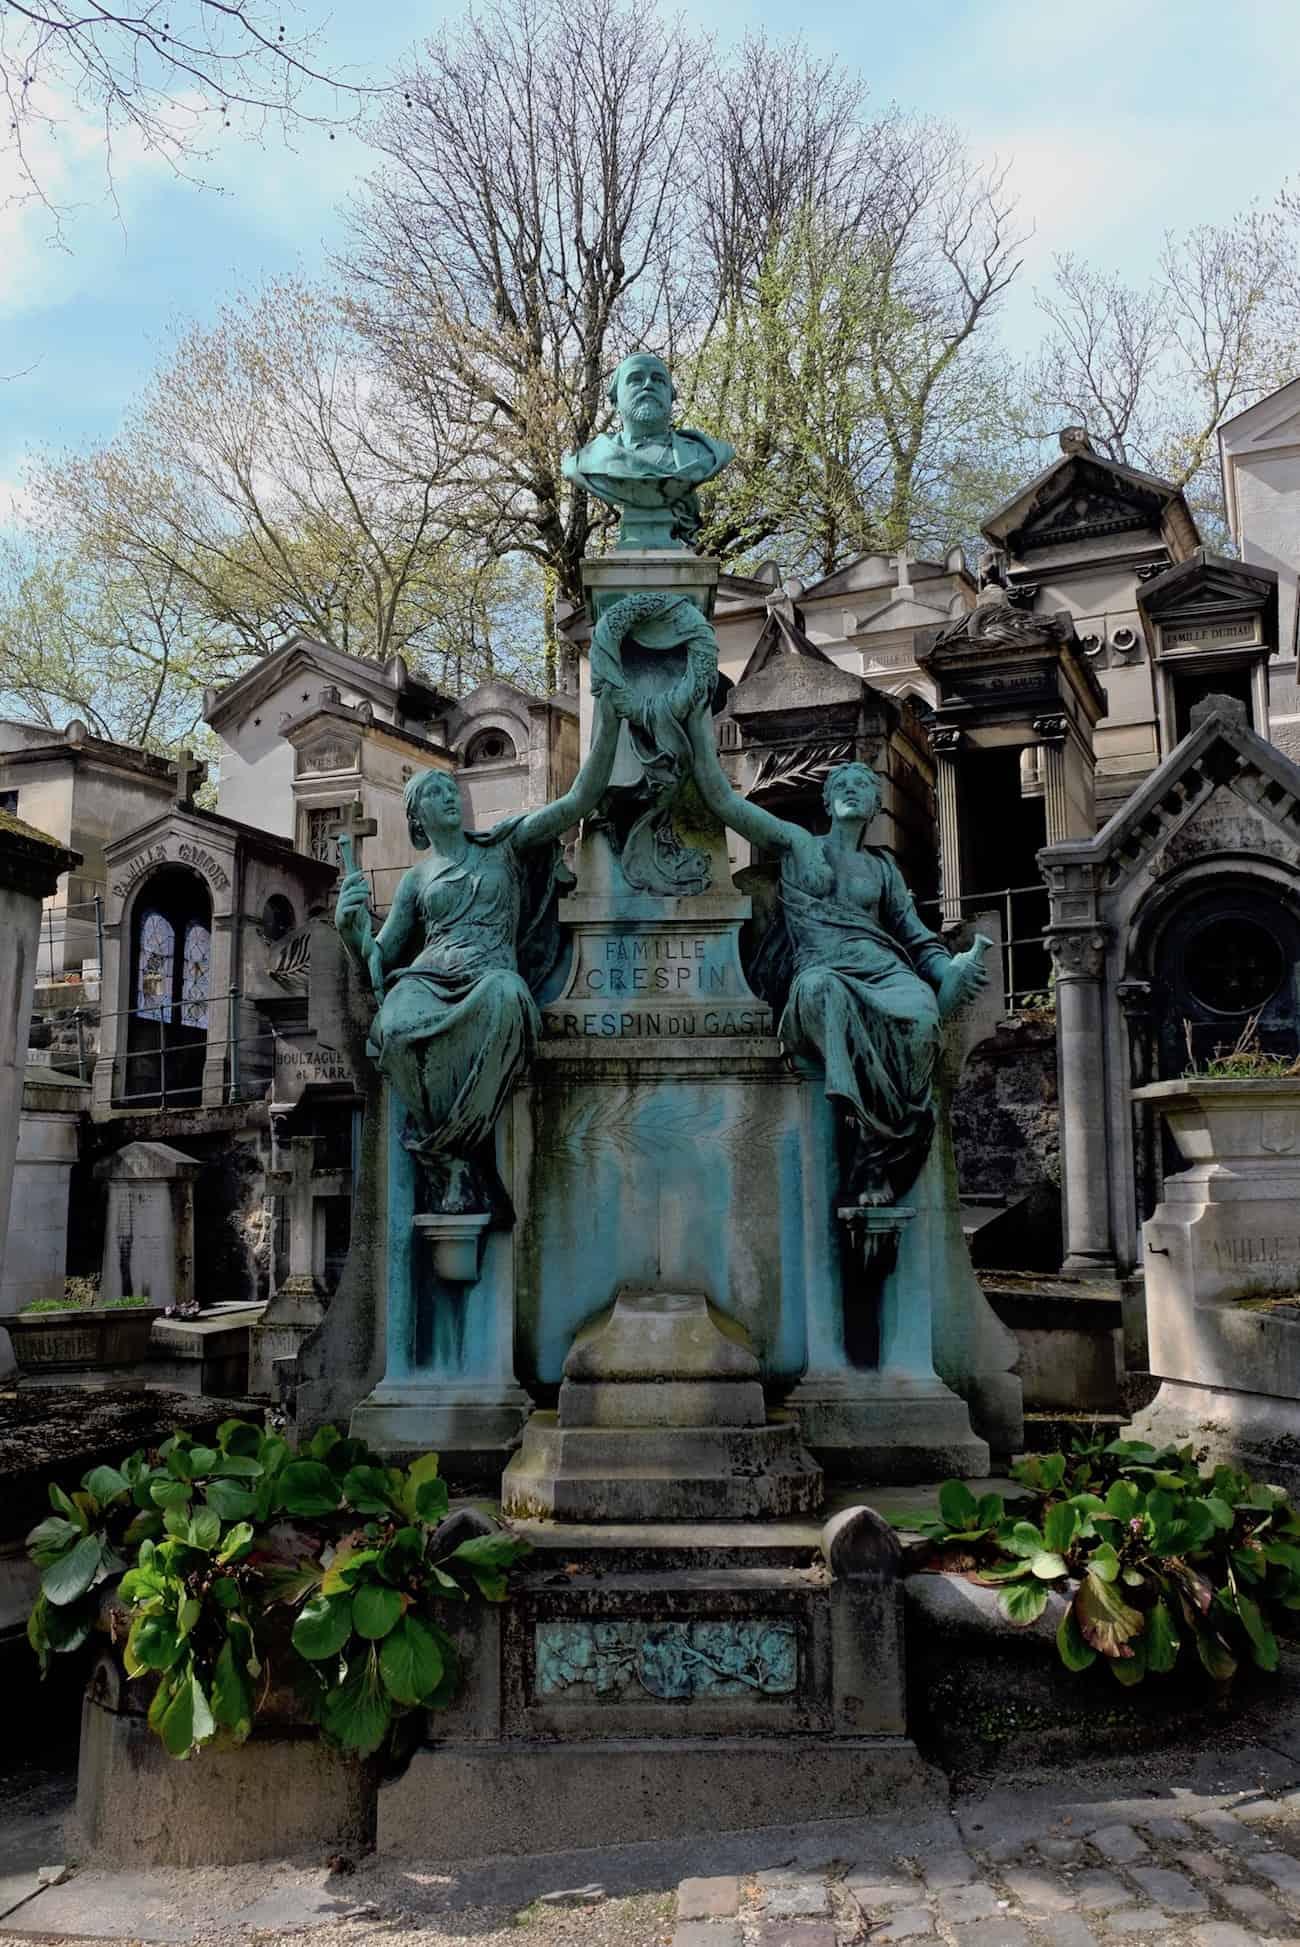 cimetière-pere-lachaise-visite-paris-20em-balade